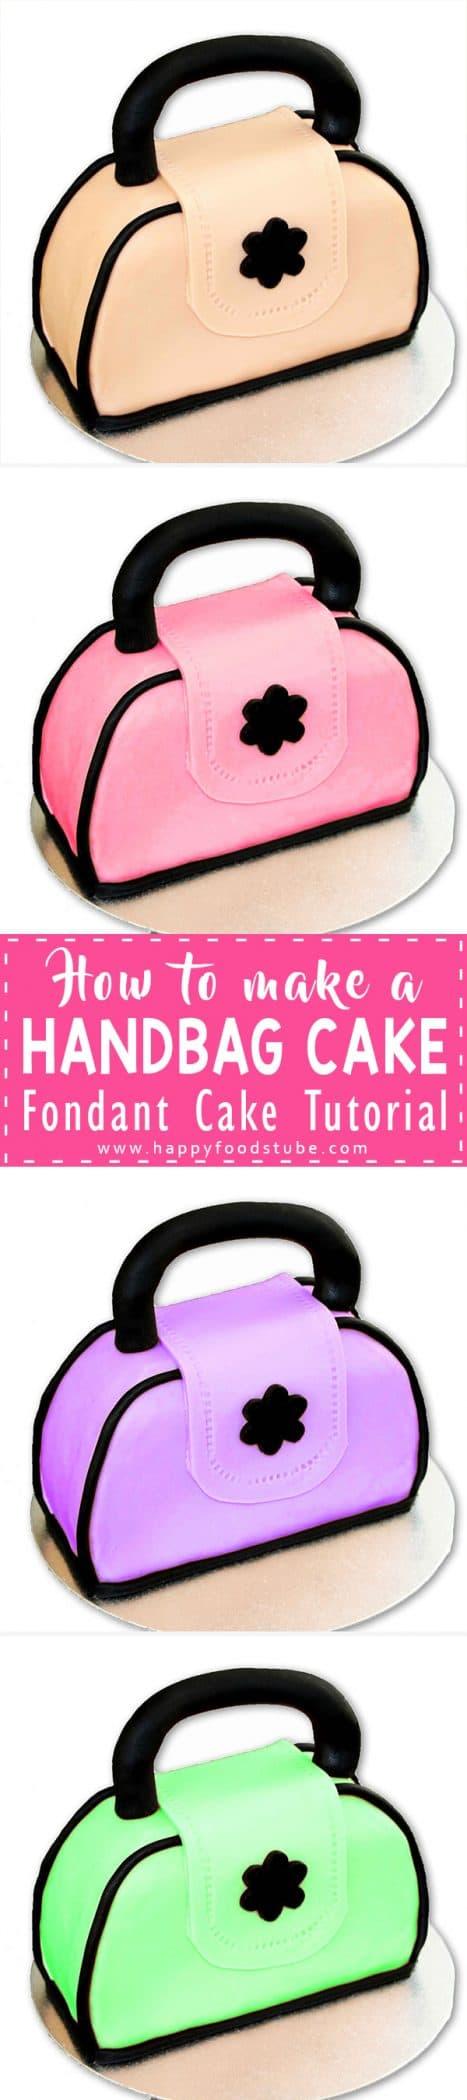 How to make a Handbag Cake Video   Happy Foods Tube